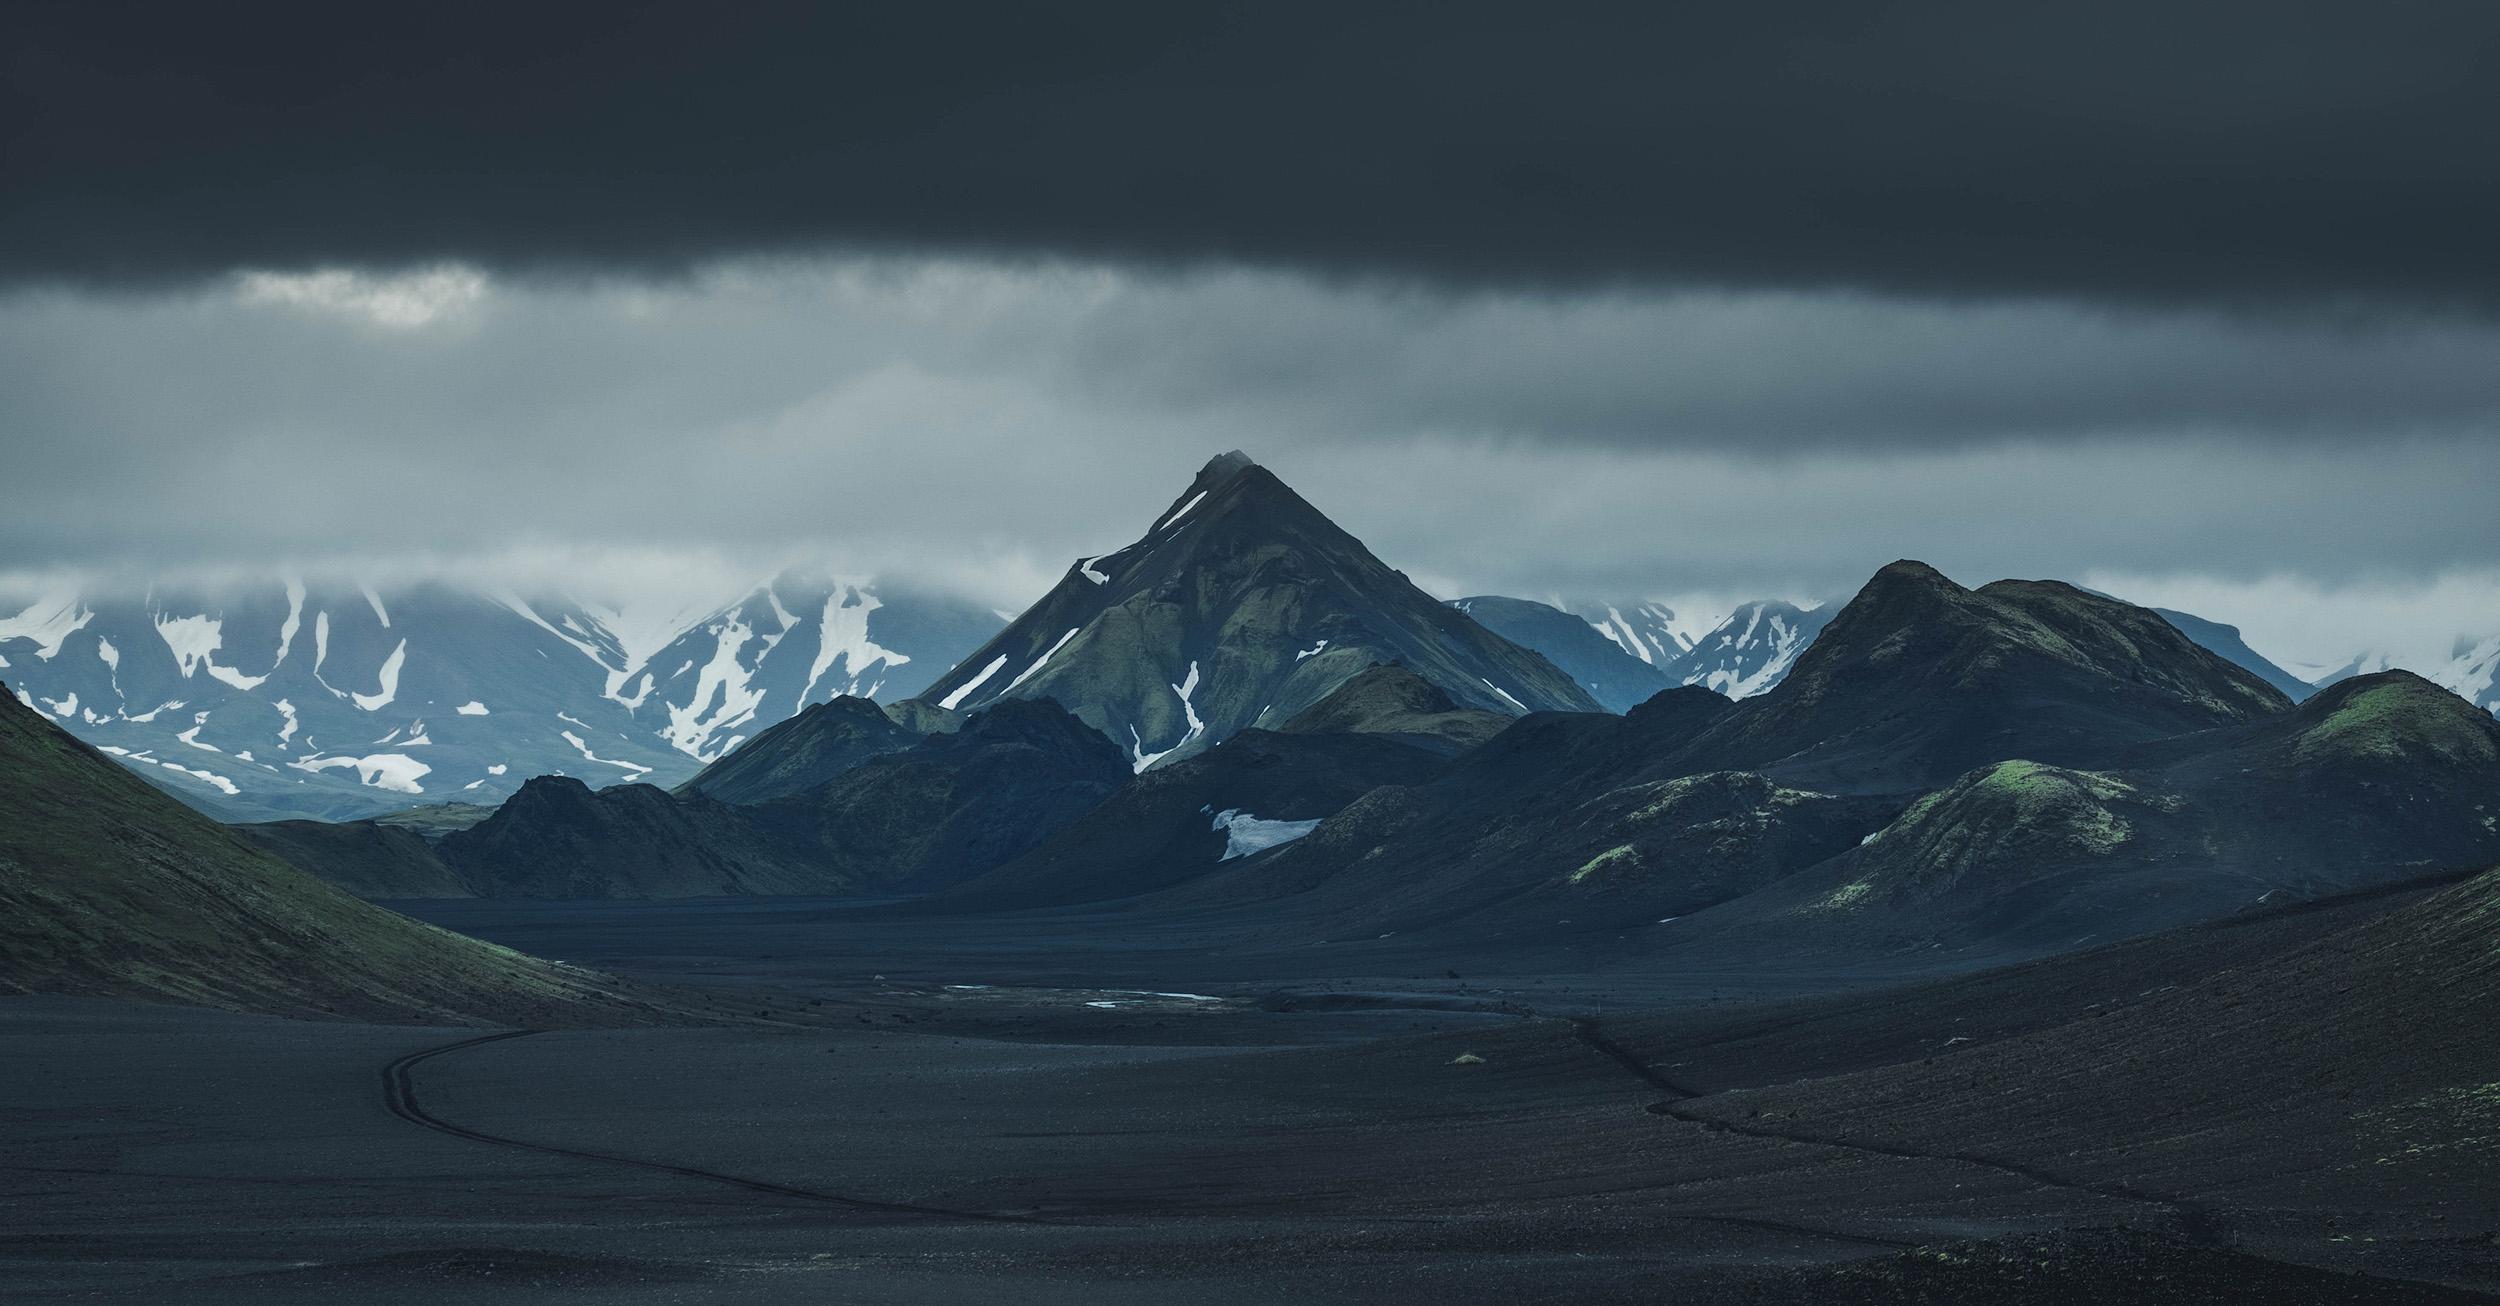 The peak of Storasula seen from Enstrur